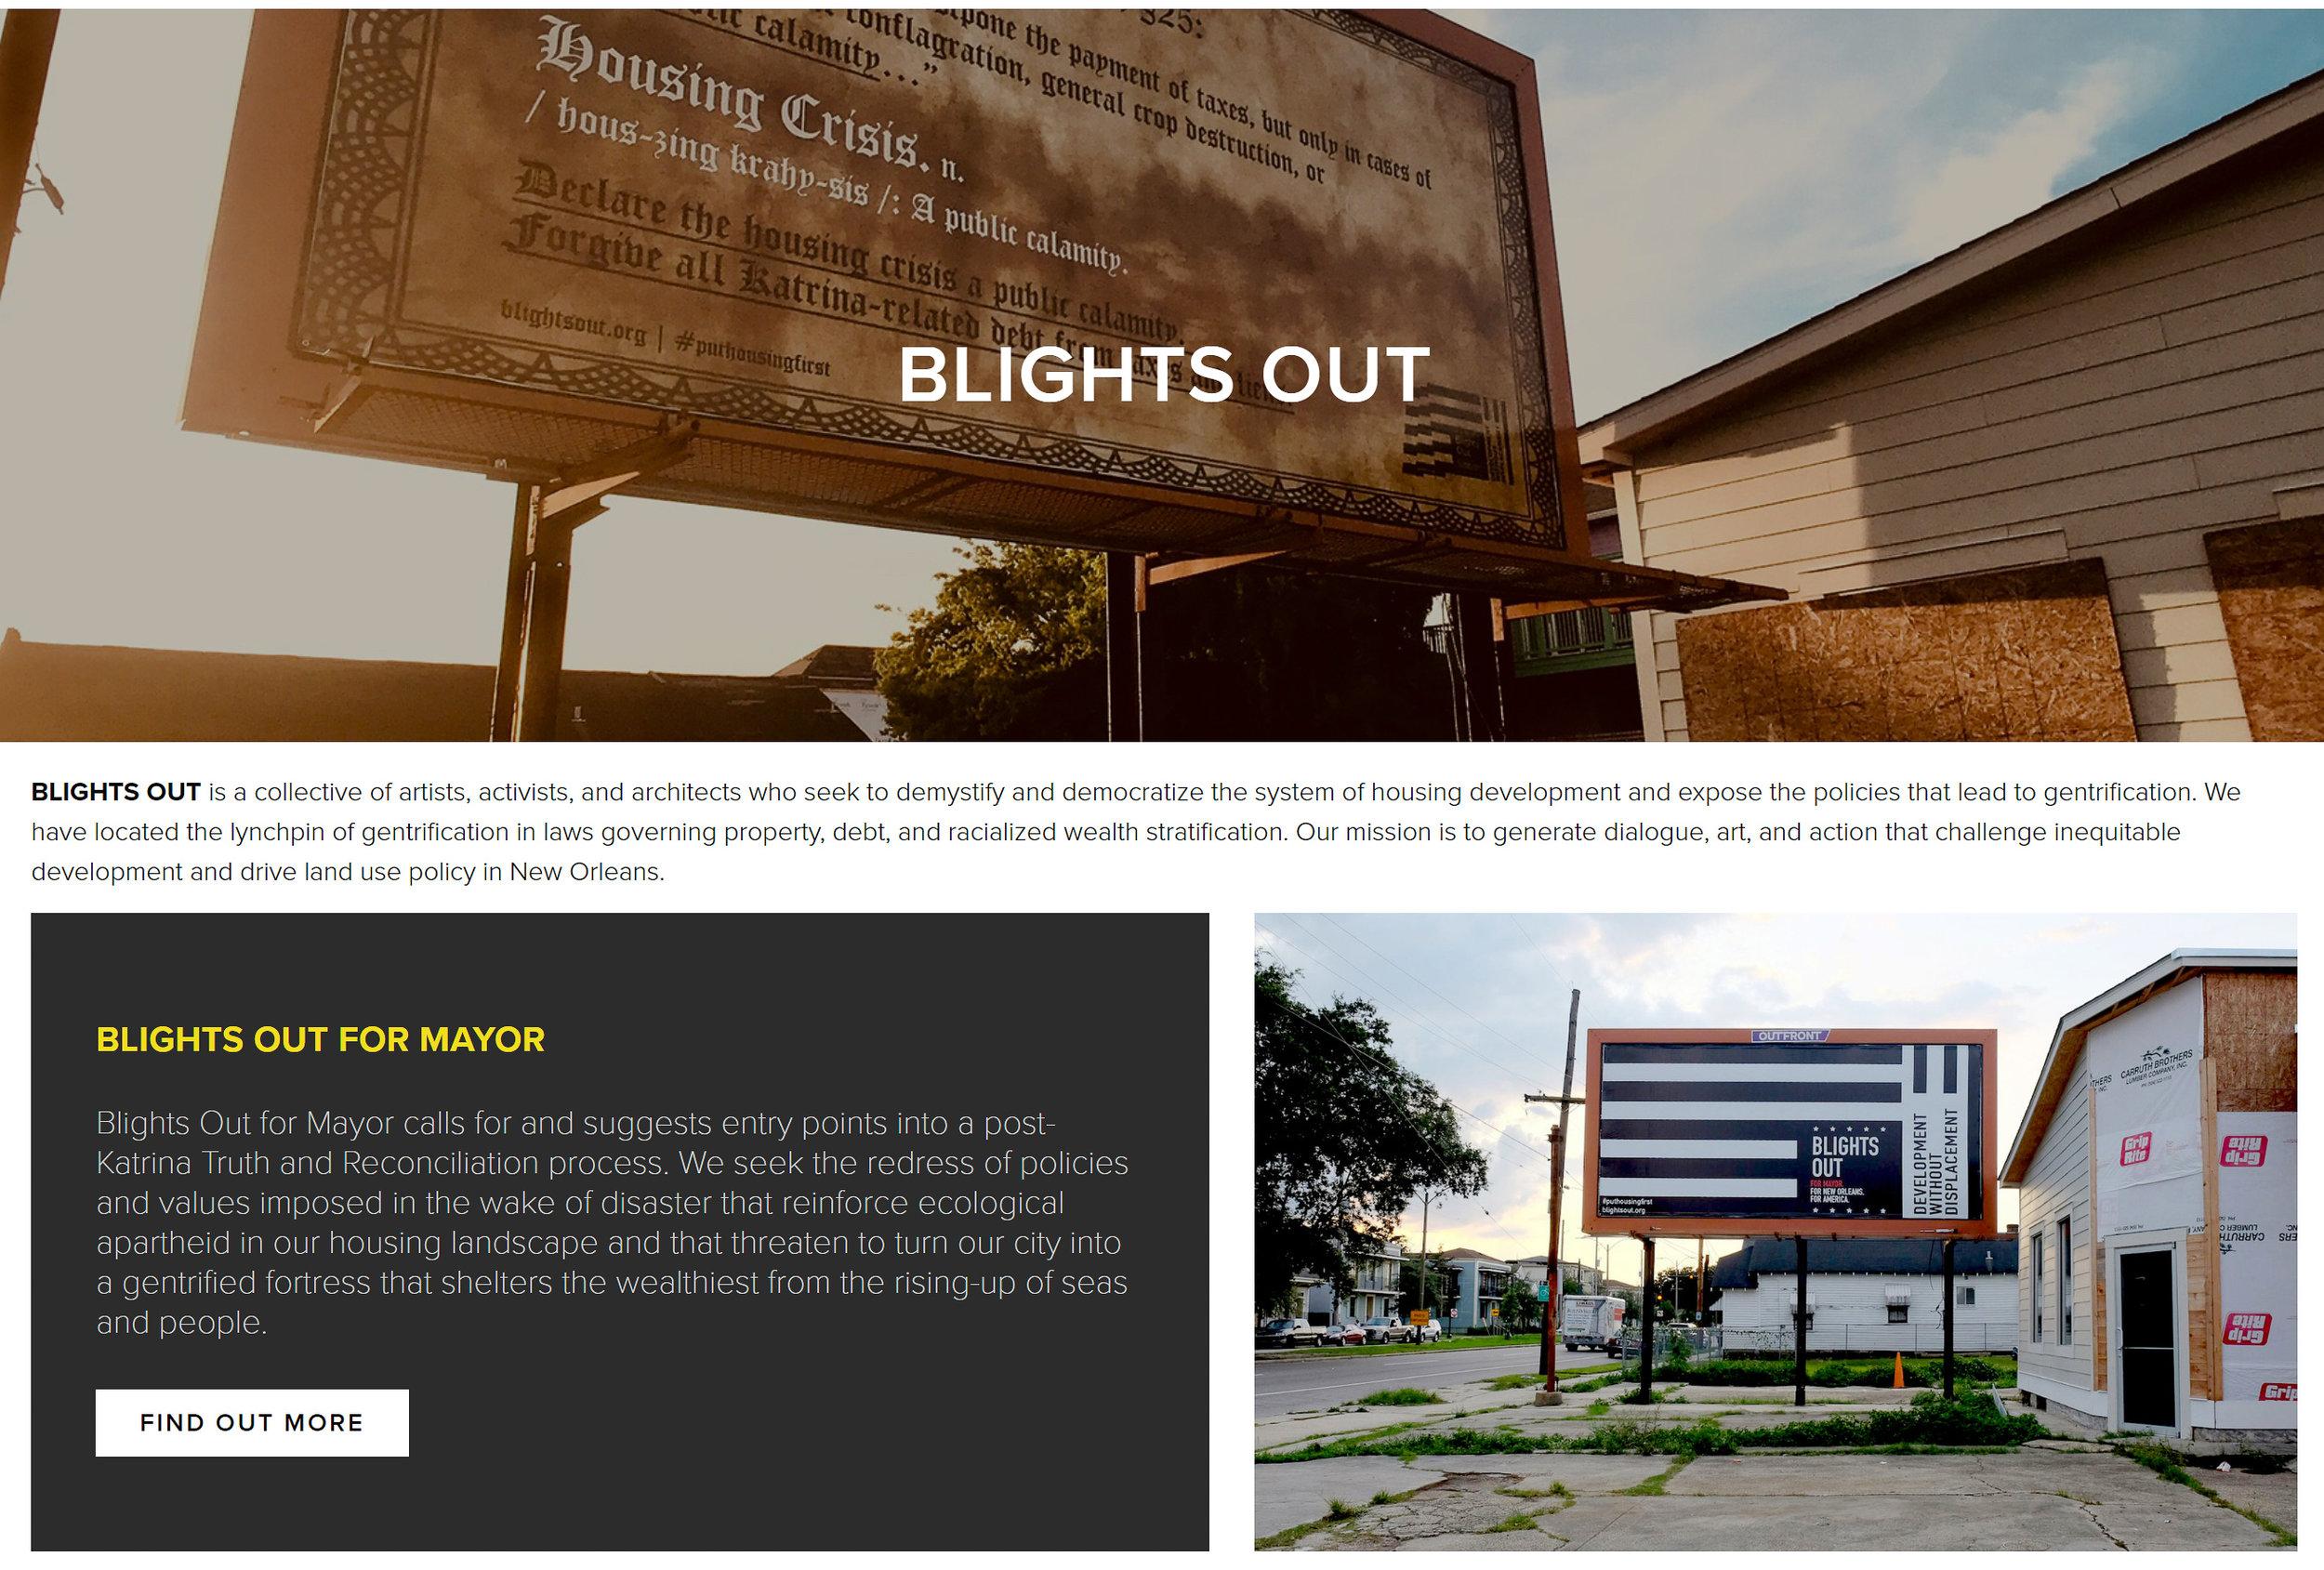 colloqate website screenshot cropped  (2).jpg